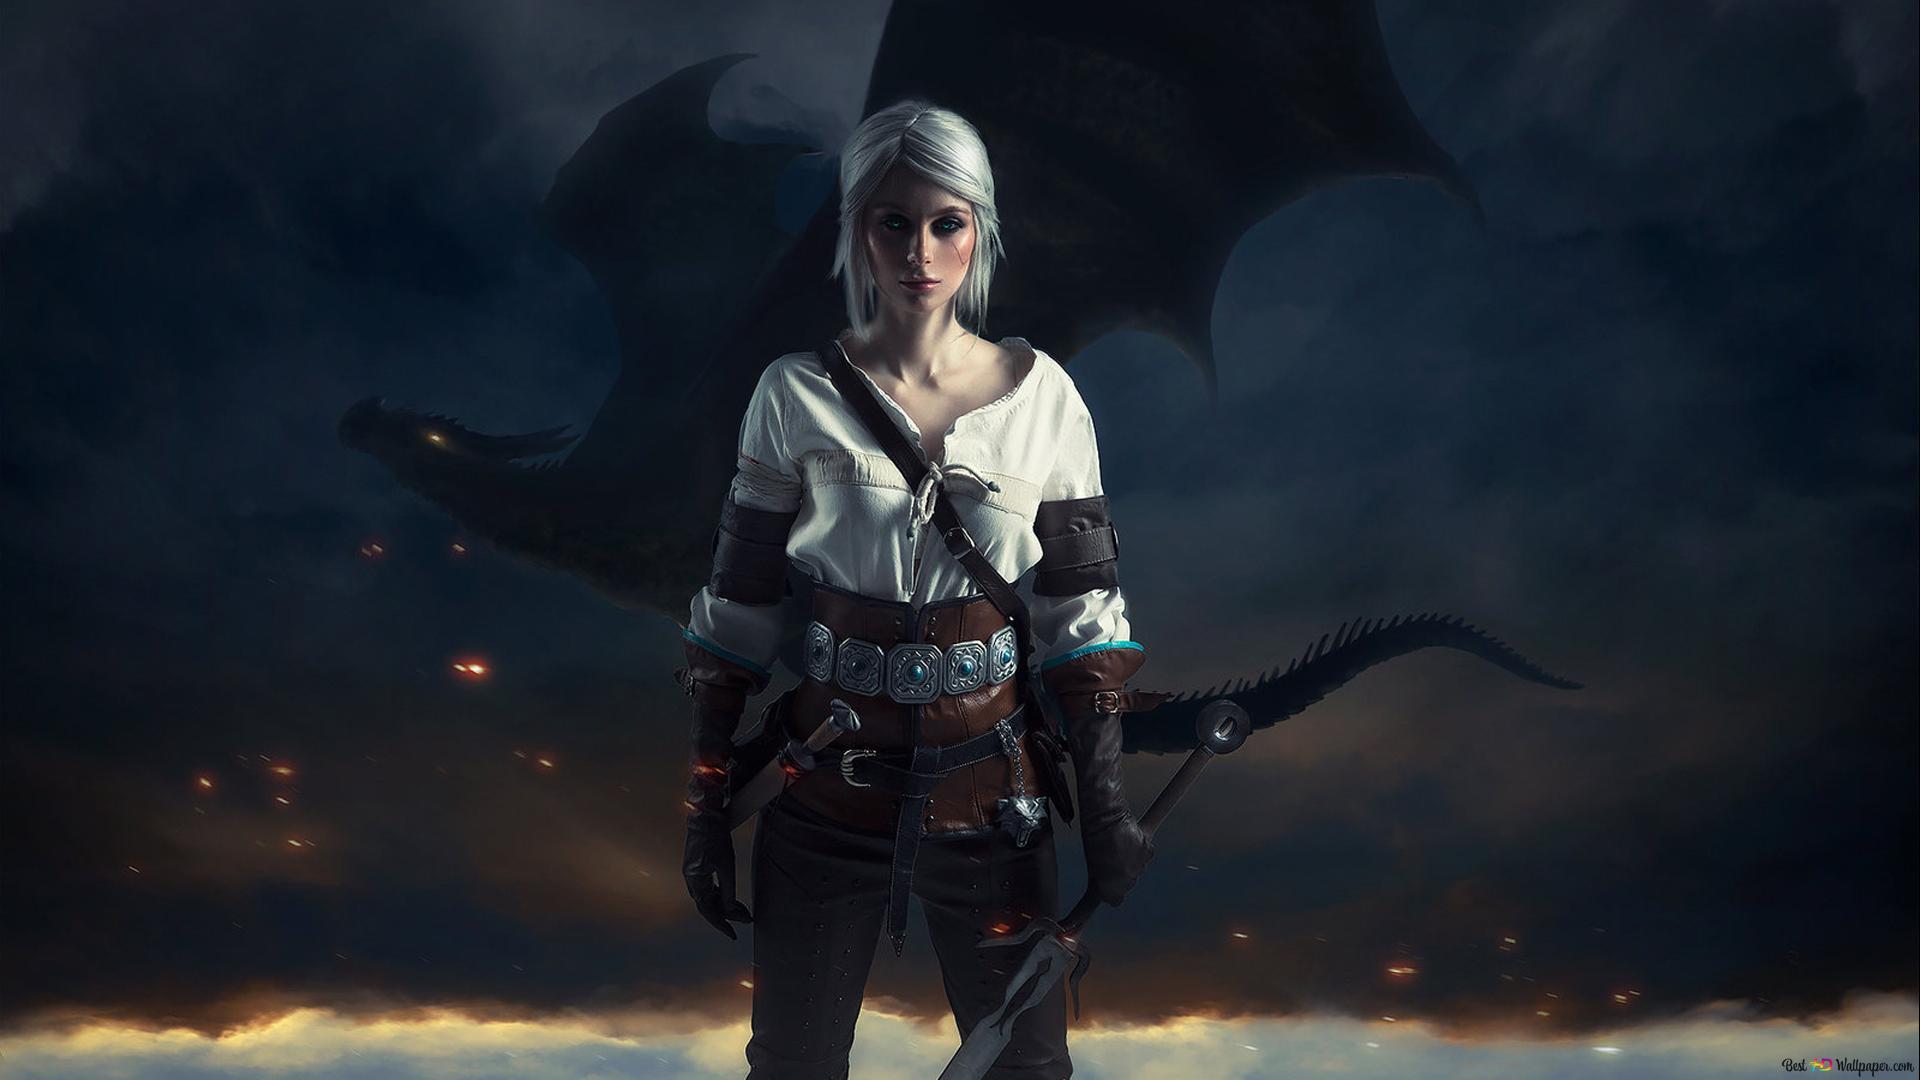 The Witcher 3 Wild Hunt Ciri Hd Wallpaper Download